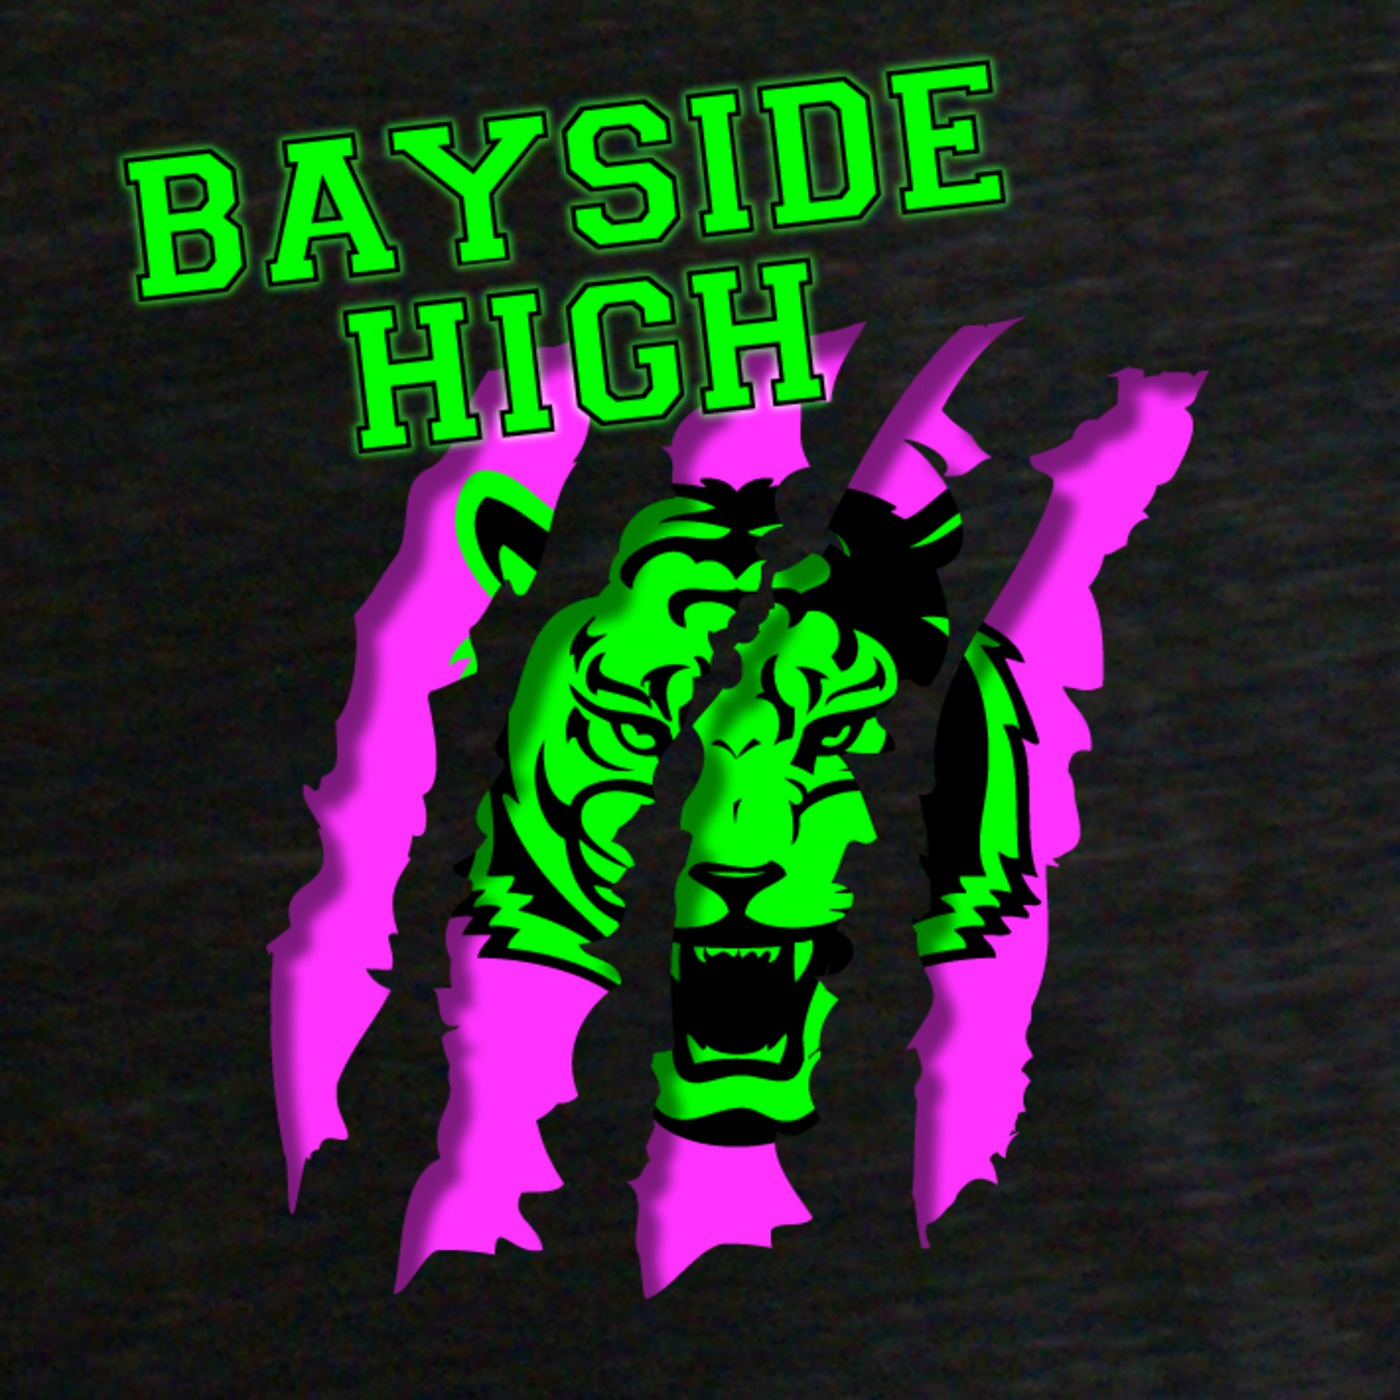 Bayside High - Extracurricular Activities